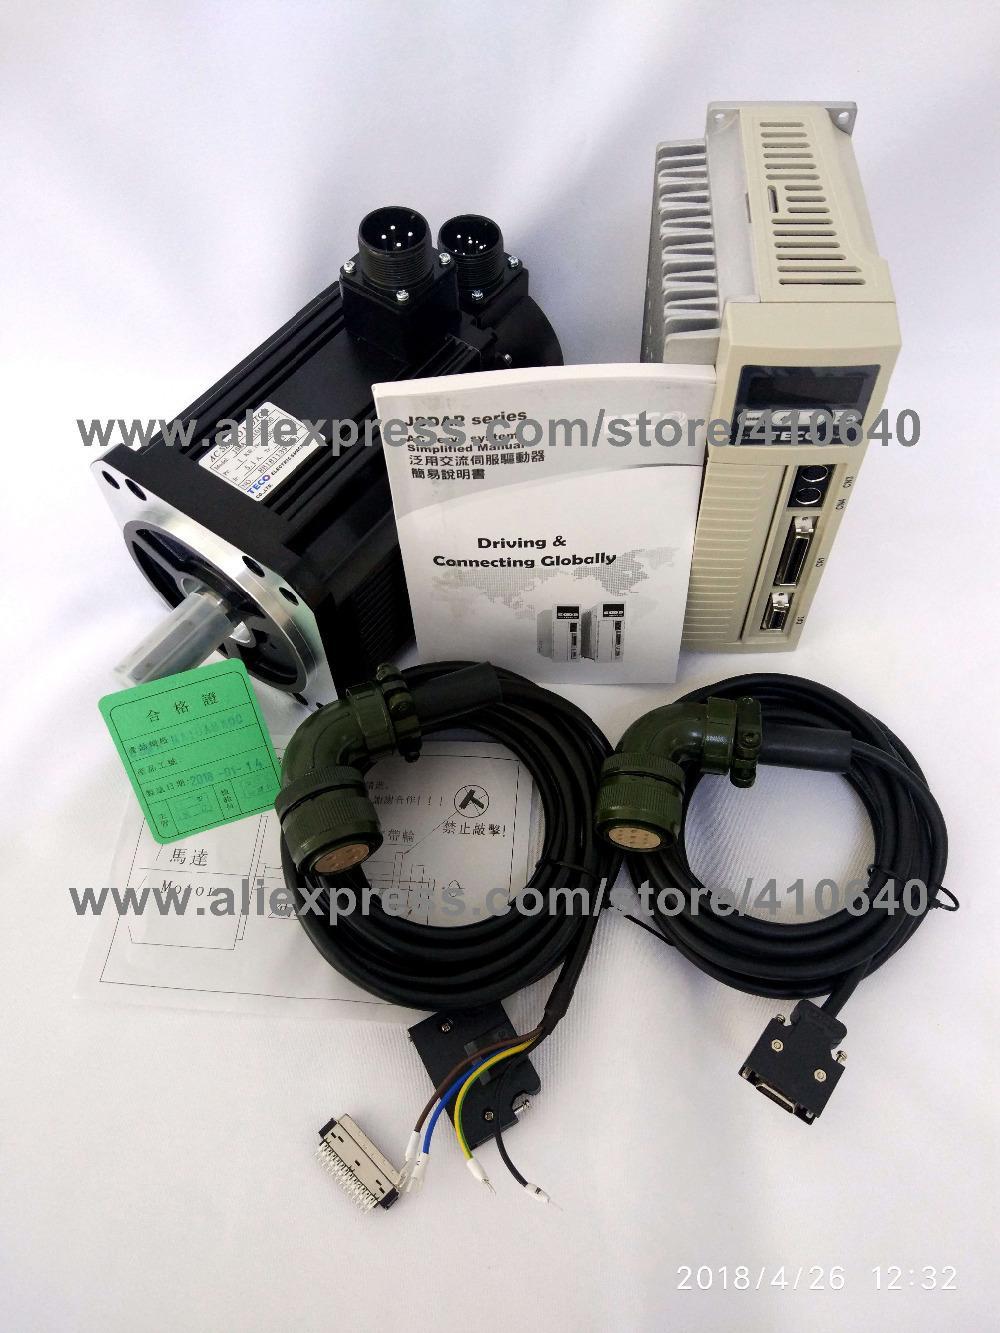 Genuine TECO 3KW Servo Motor JSMA-MB30ABK01 and Servo Motor Drive JSDA-75A3 with 42.96 Peak Torque